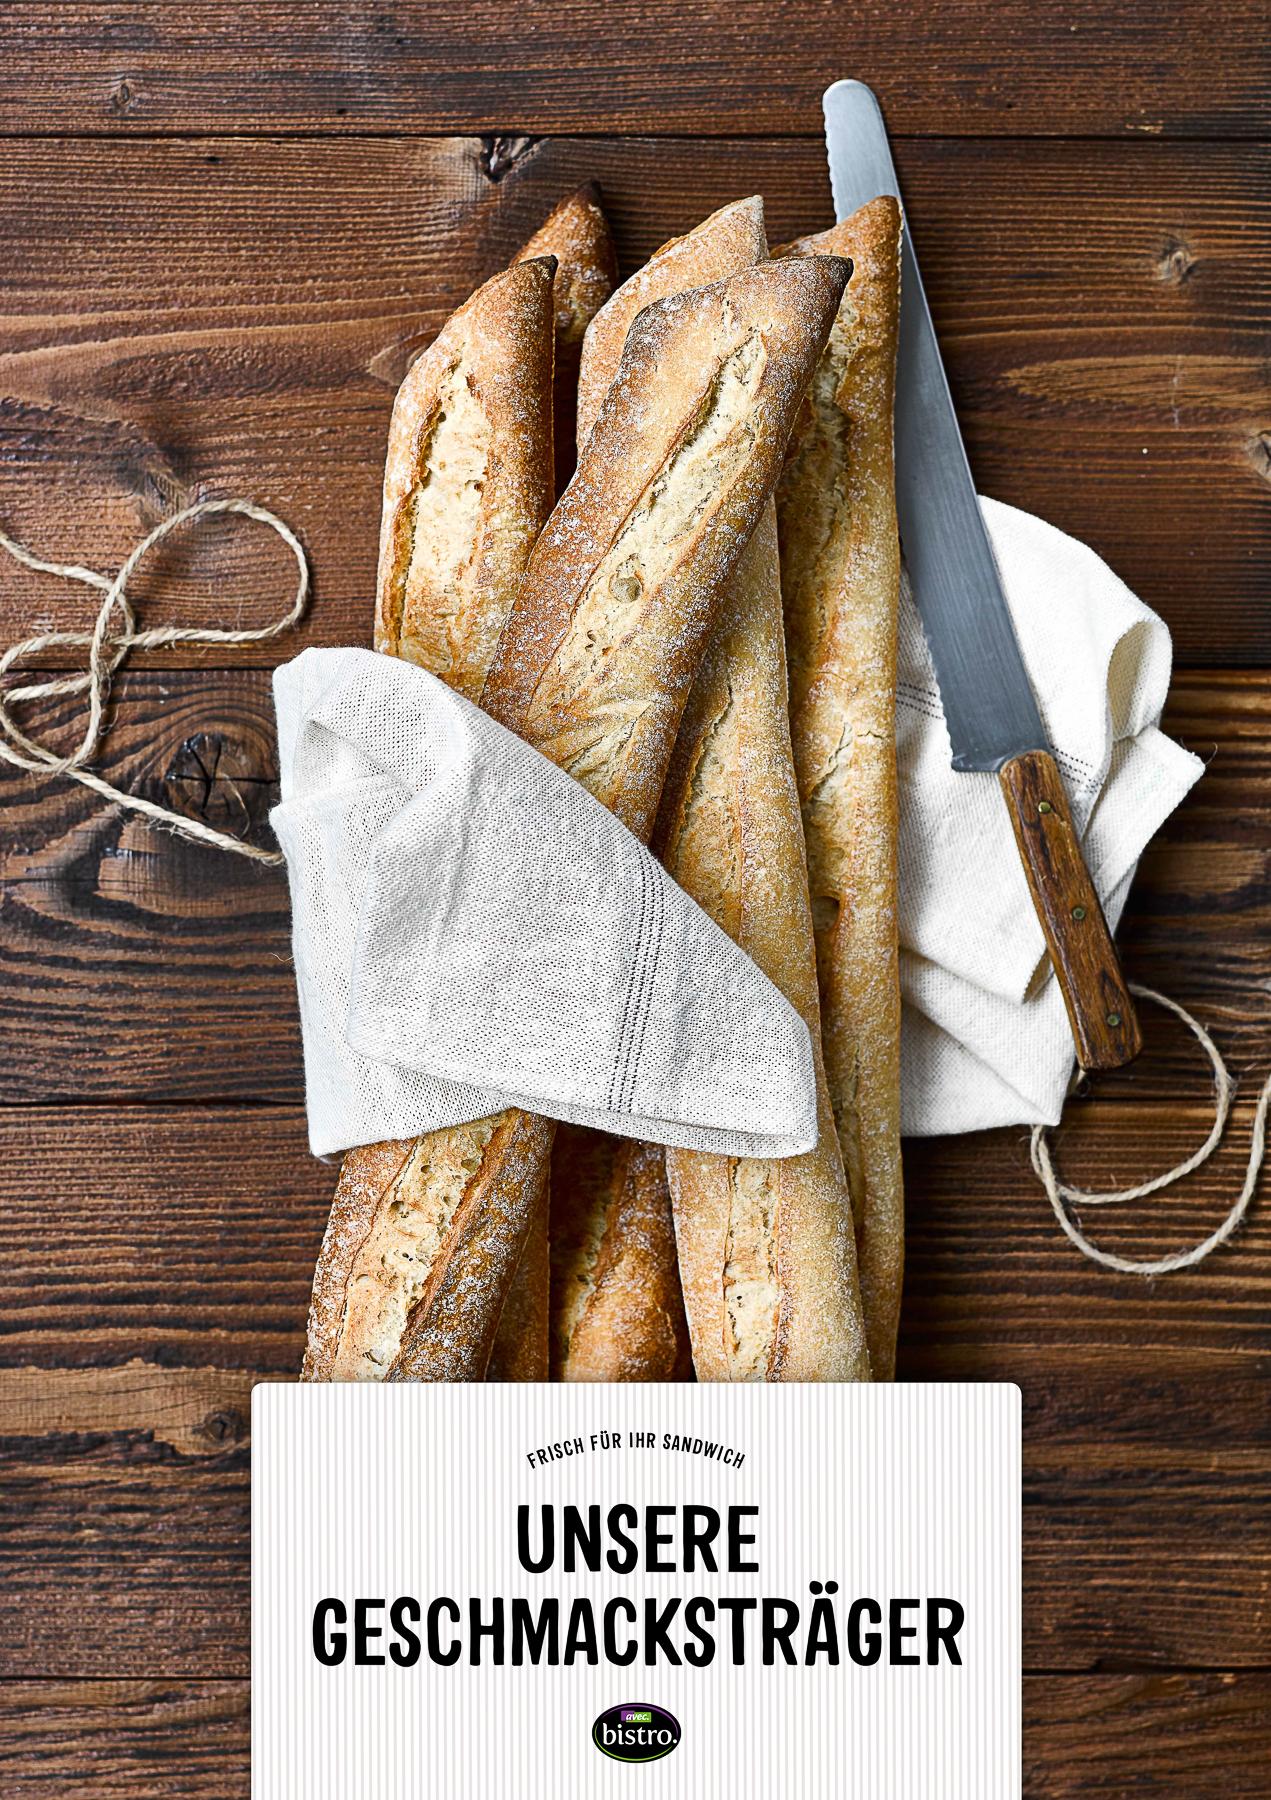 Food-Fotografie Sandwiches-Zubereitung, Stefan Schmidlin Fotograf Basel; Bild 3.jpg